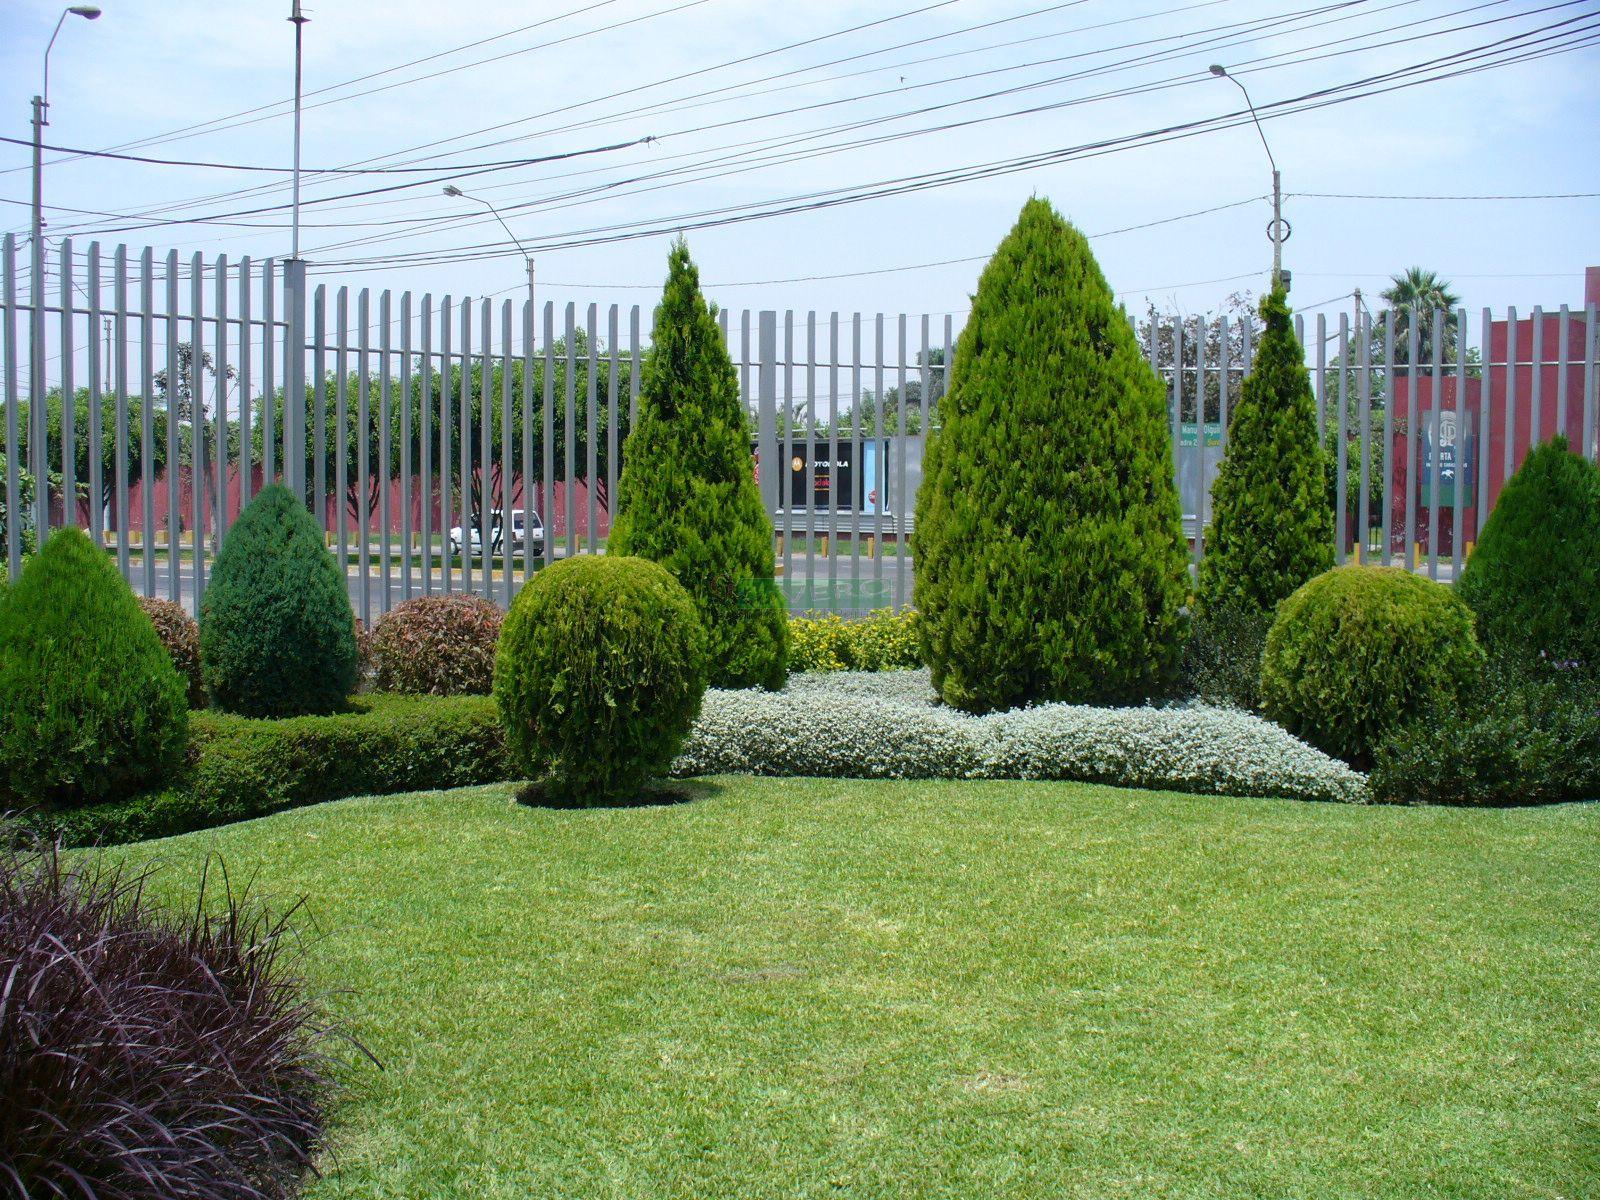 Dise o de jardines for Diseno de jardines uruguay